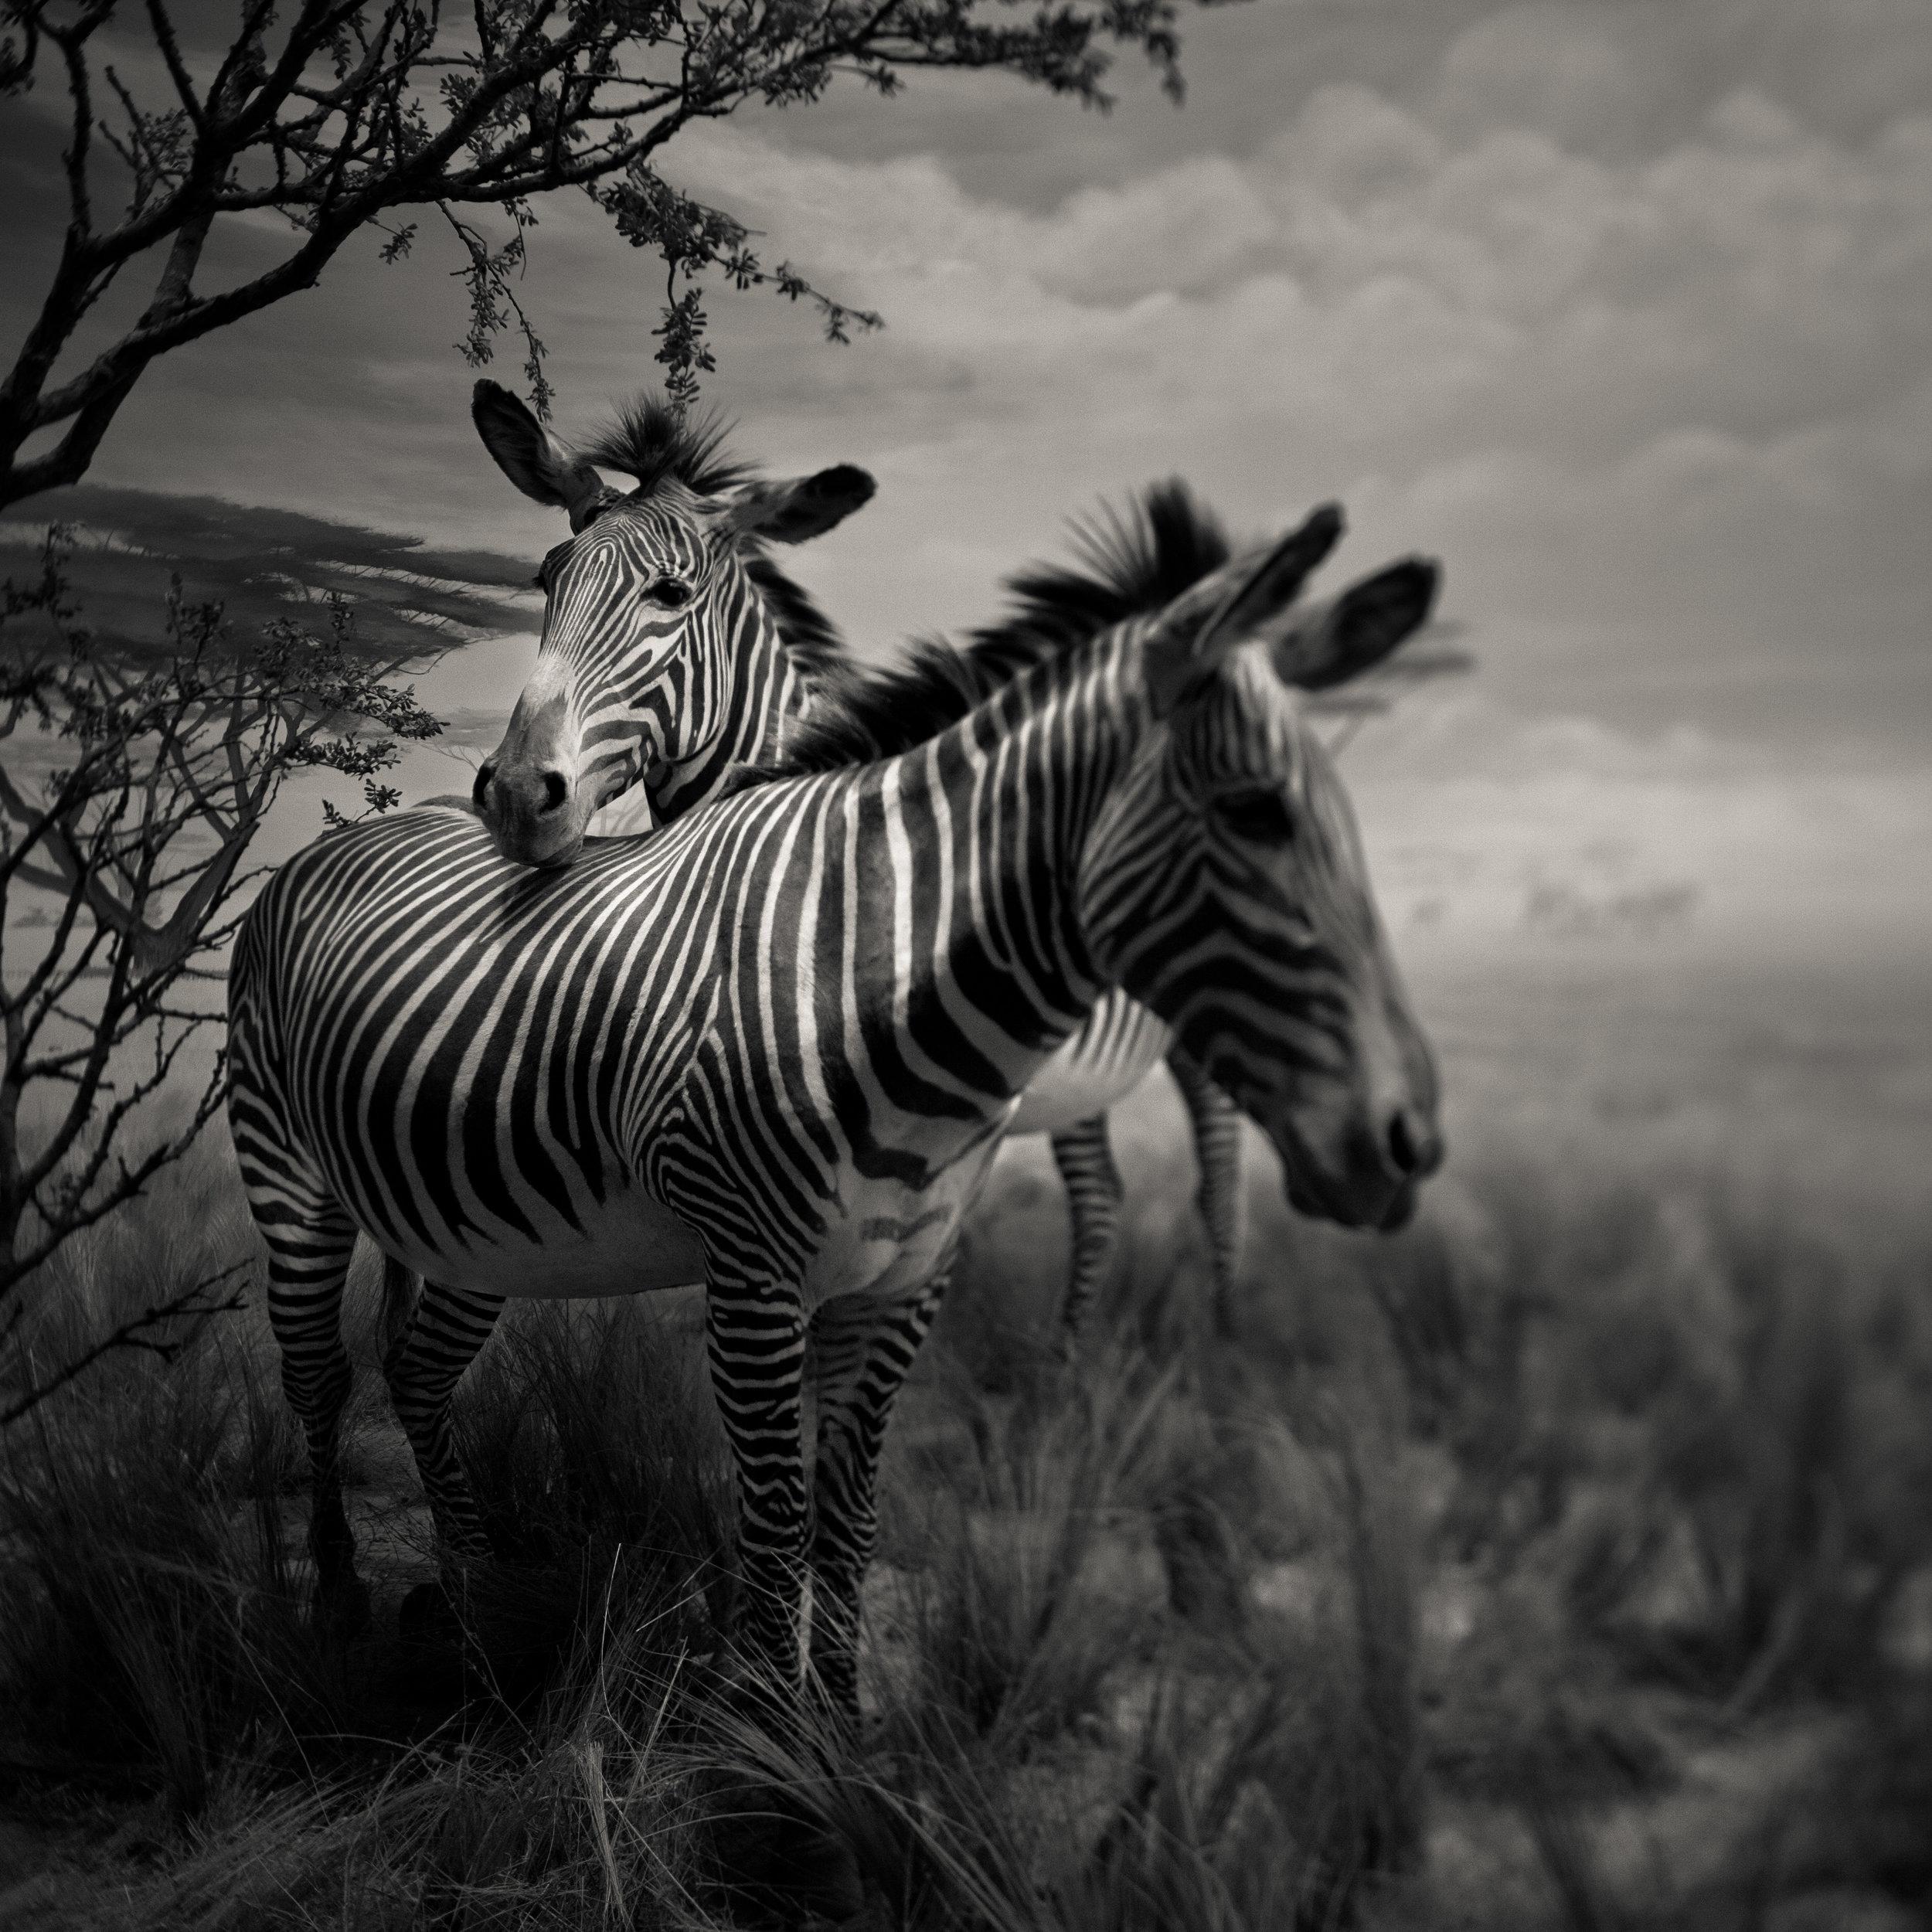 San Francisco academy science black white golden gate park zebra africa plains exhibit